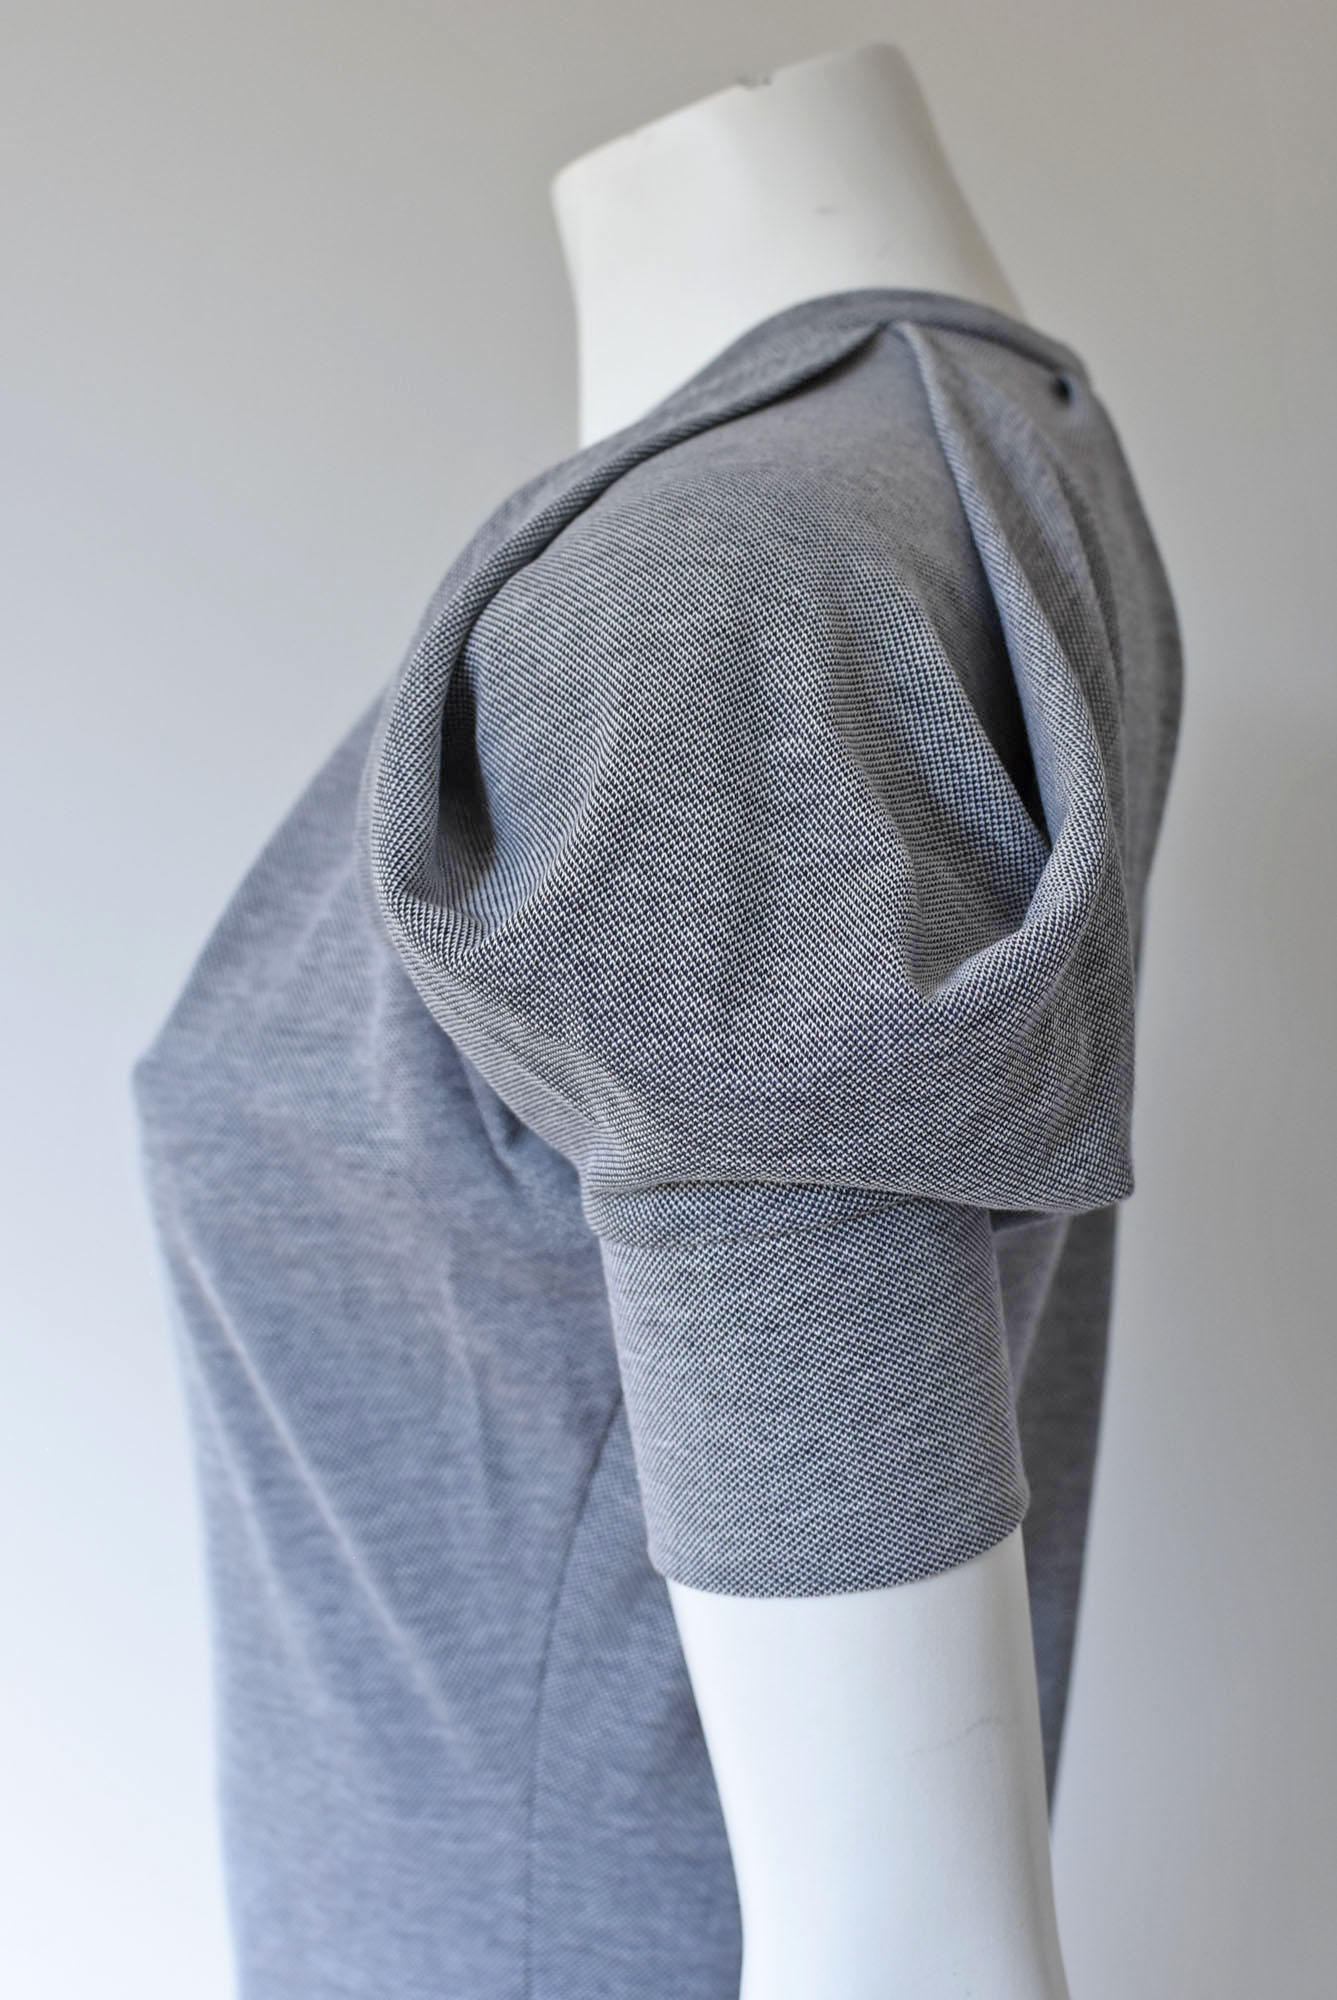 08 - MUSCLE-DRESS shortarm